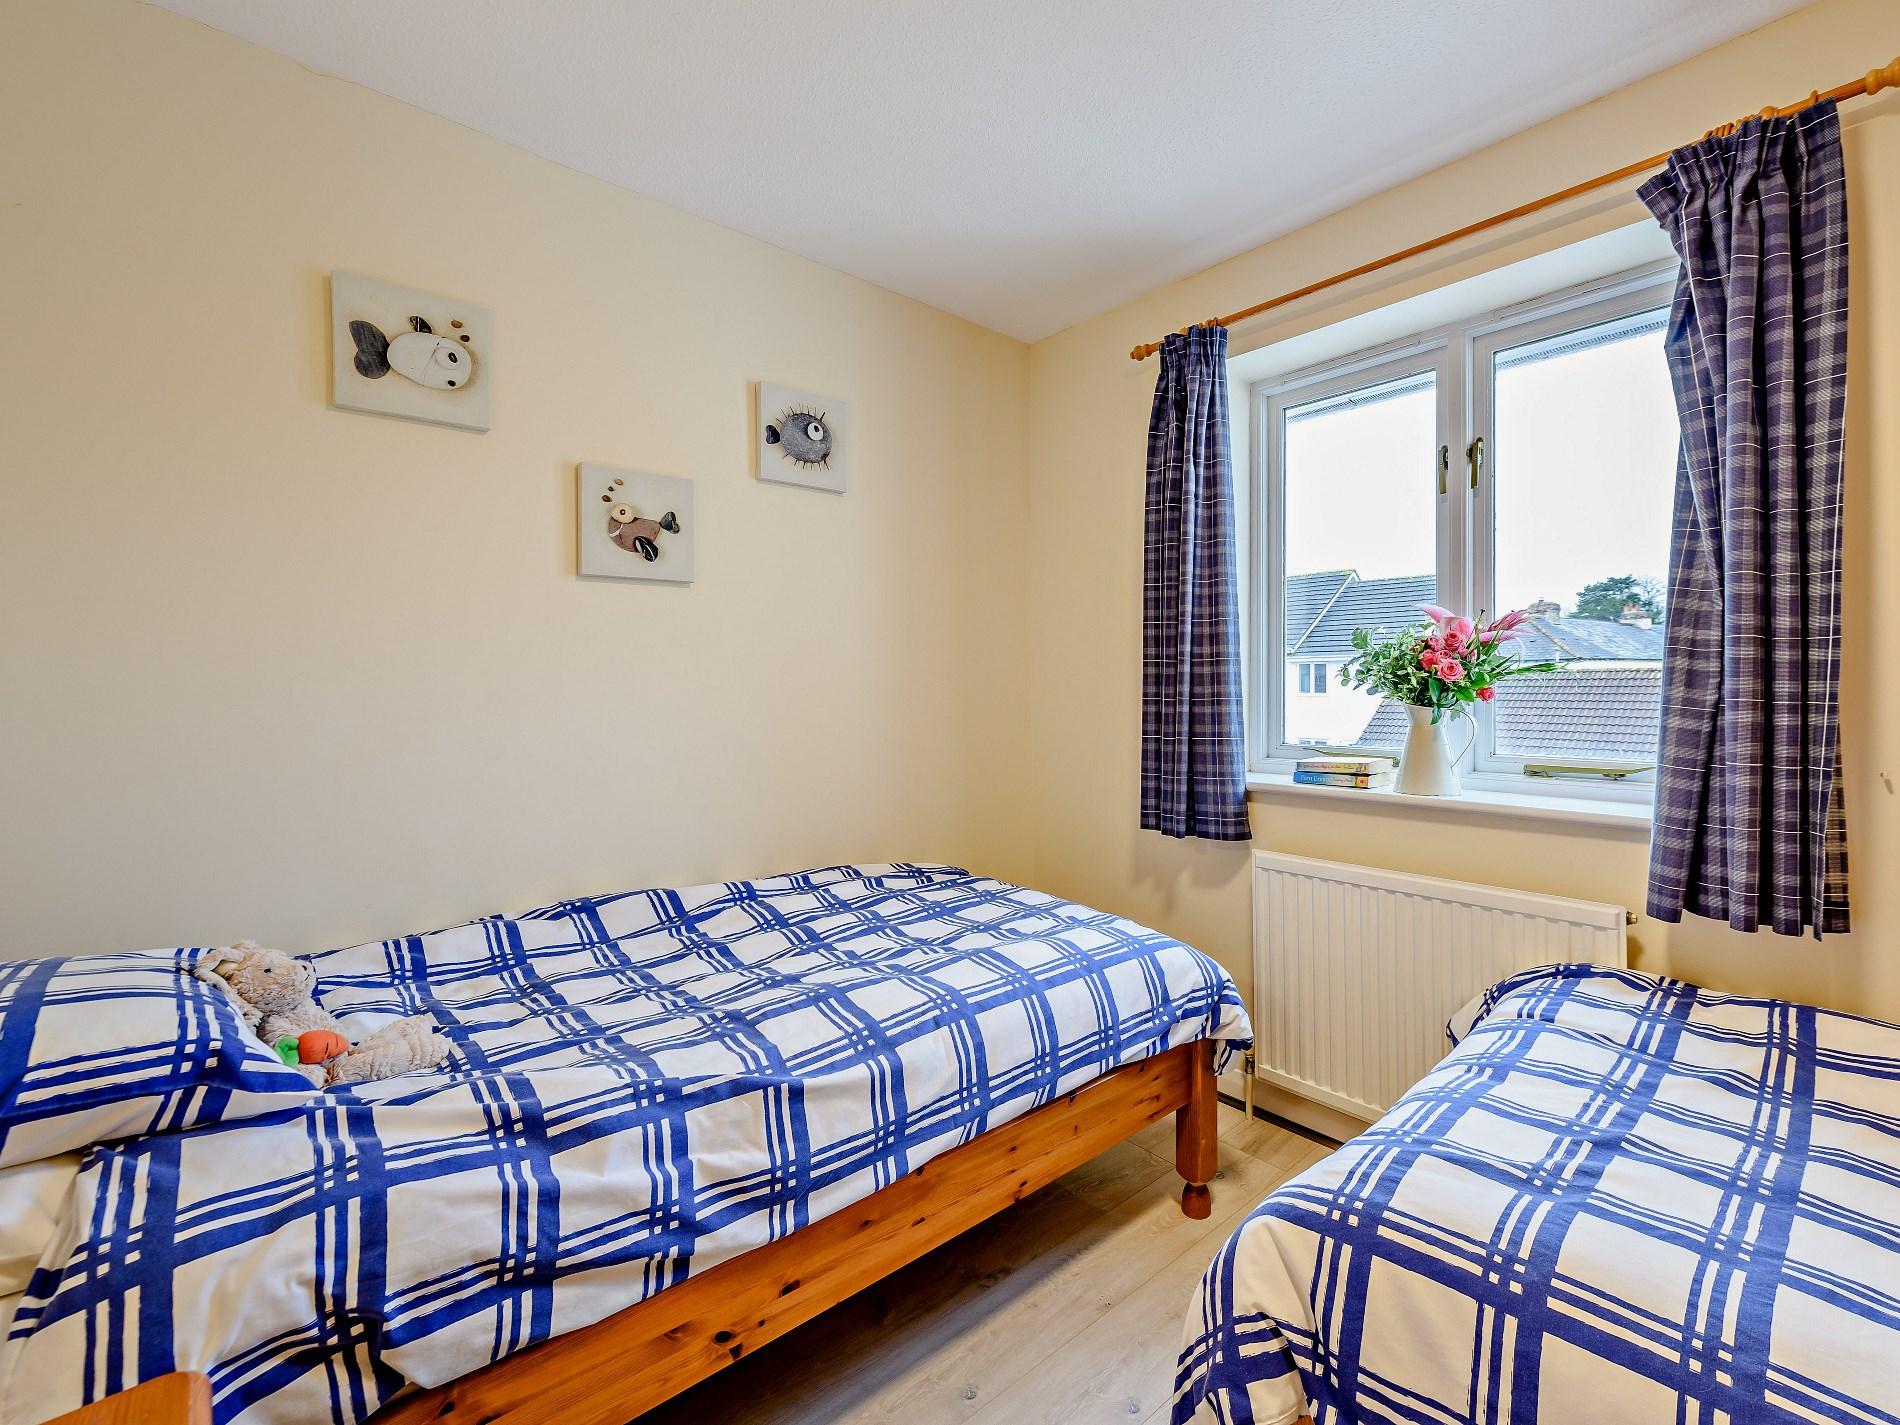 2 Bedroom House in North Devon, Devon